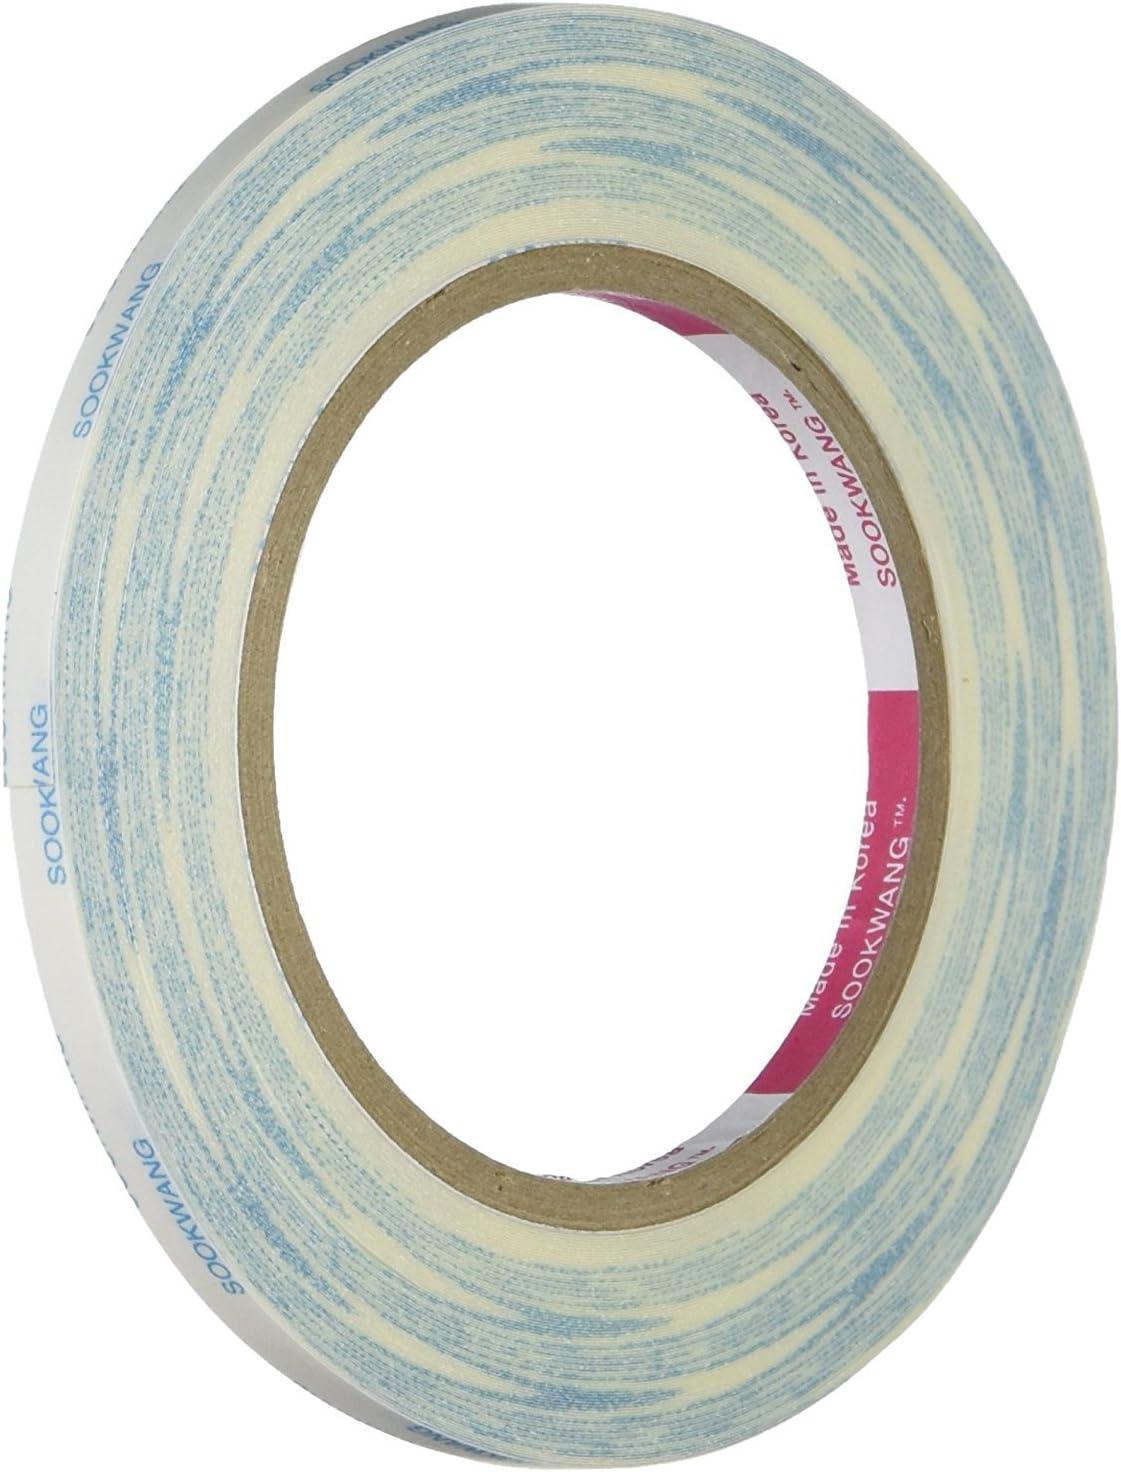 Scor-Pal Products 95647 Scor-Tape .375X27Yd 25//Pkg 27yds Pack